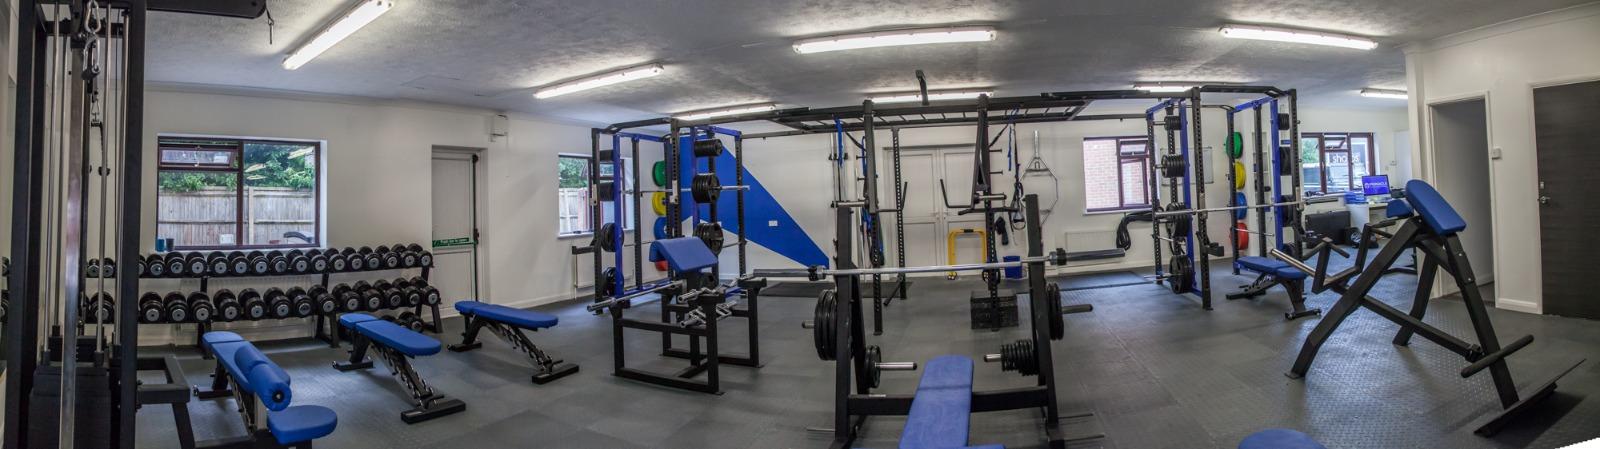 Atlas gym website.jpg